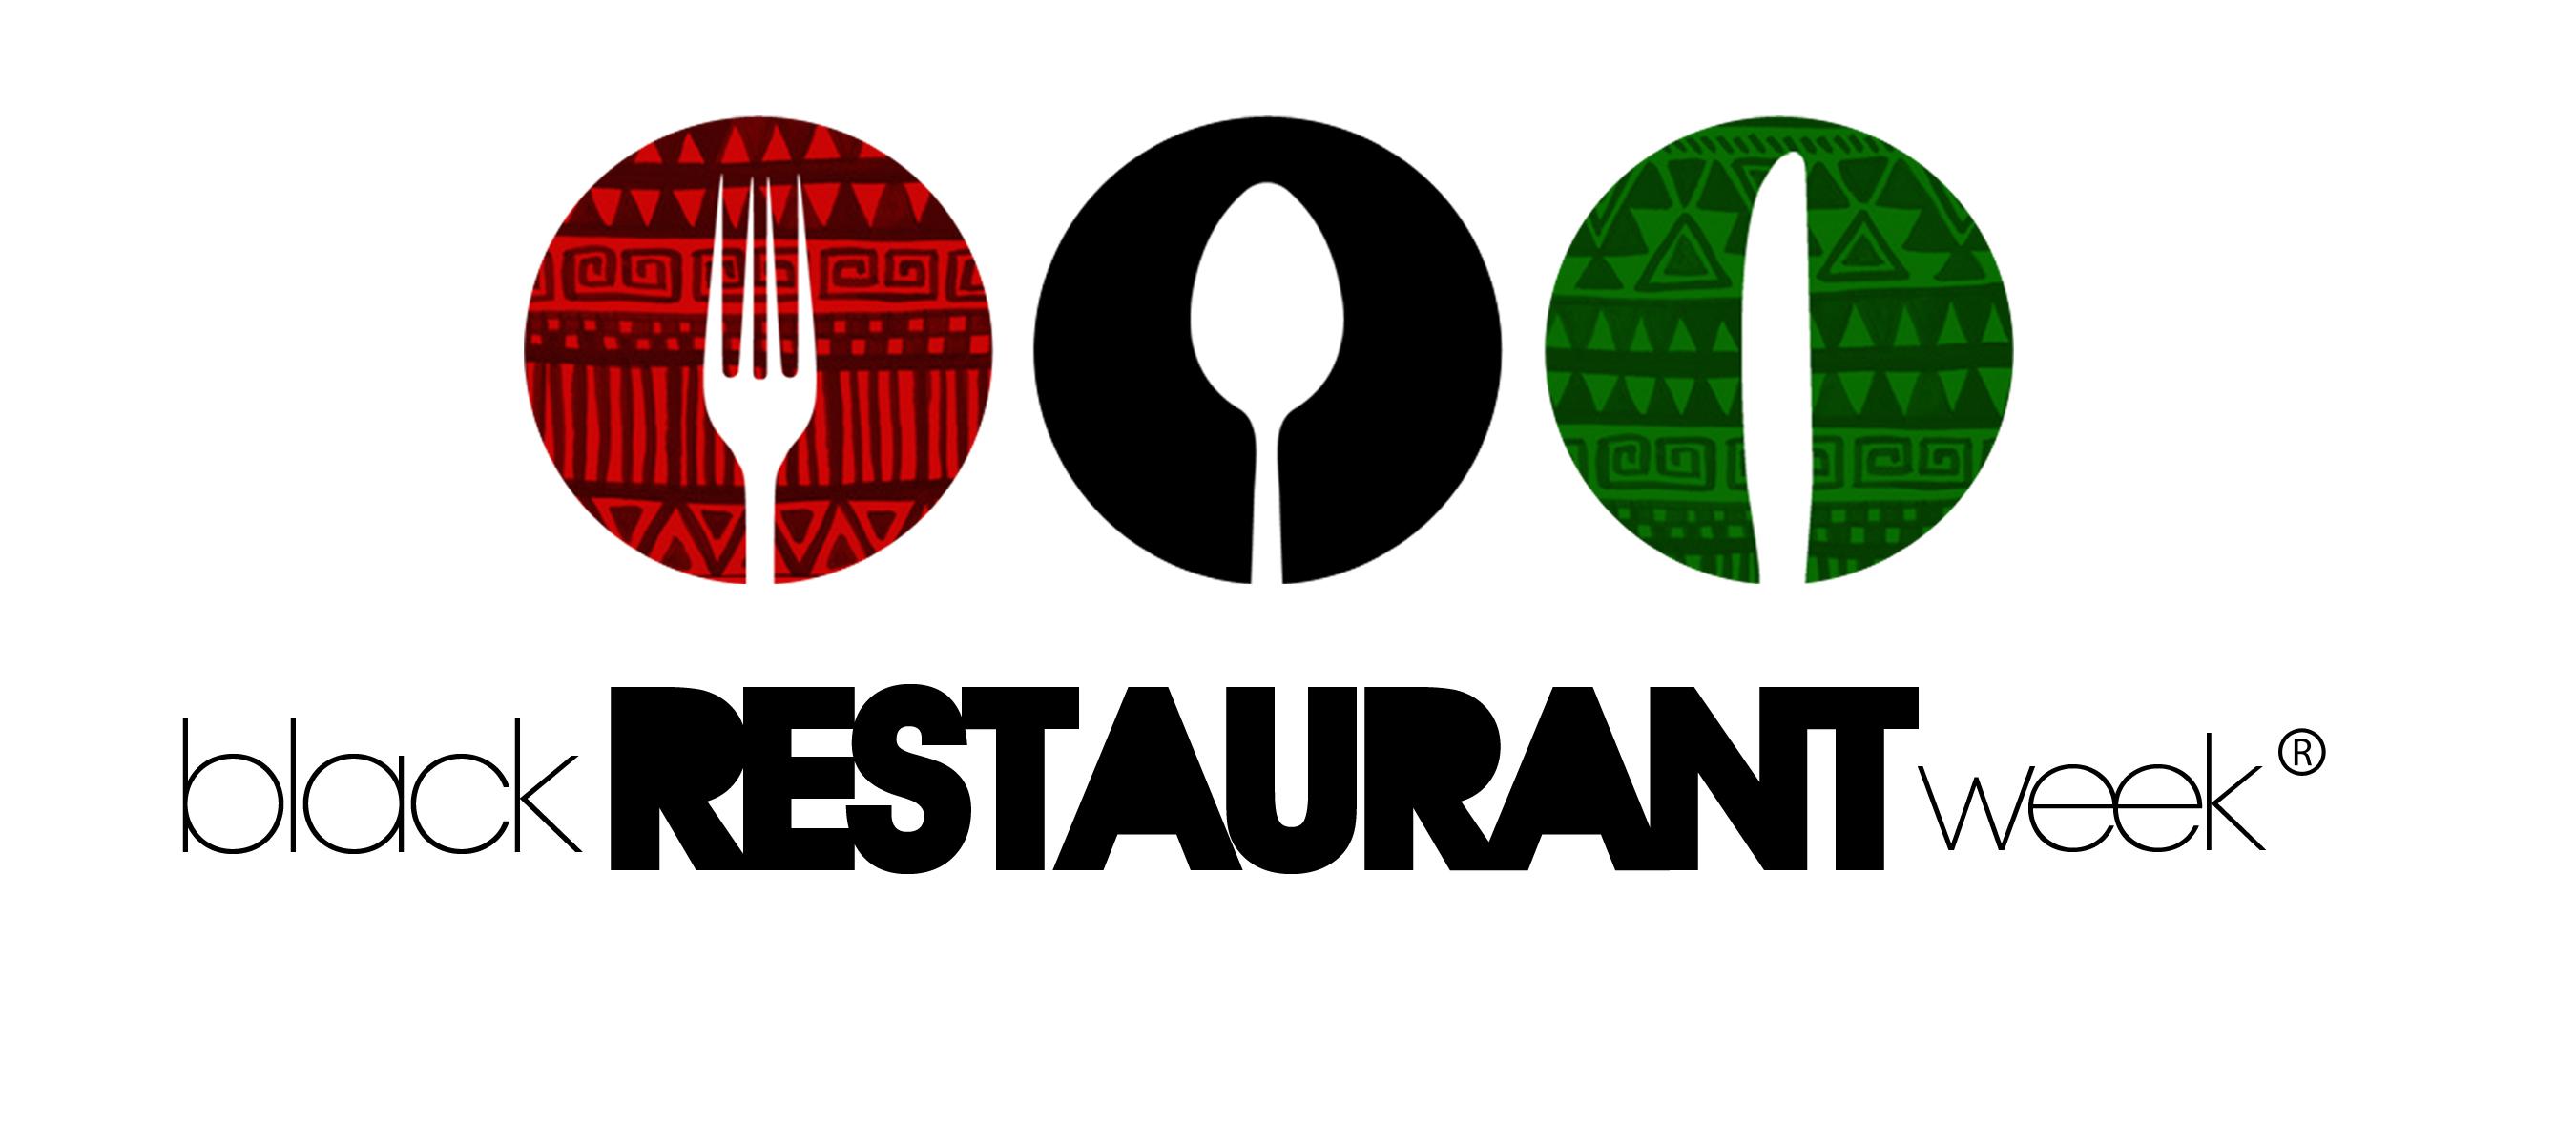 Follow Your Fork to Houston Black Restaurant Week – 2girlswhotravel